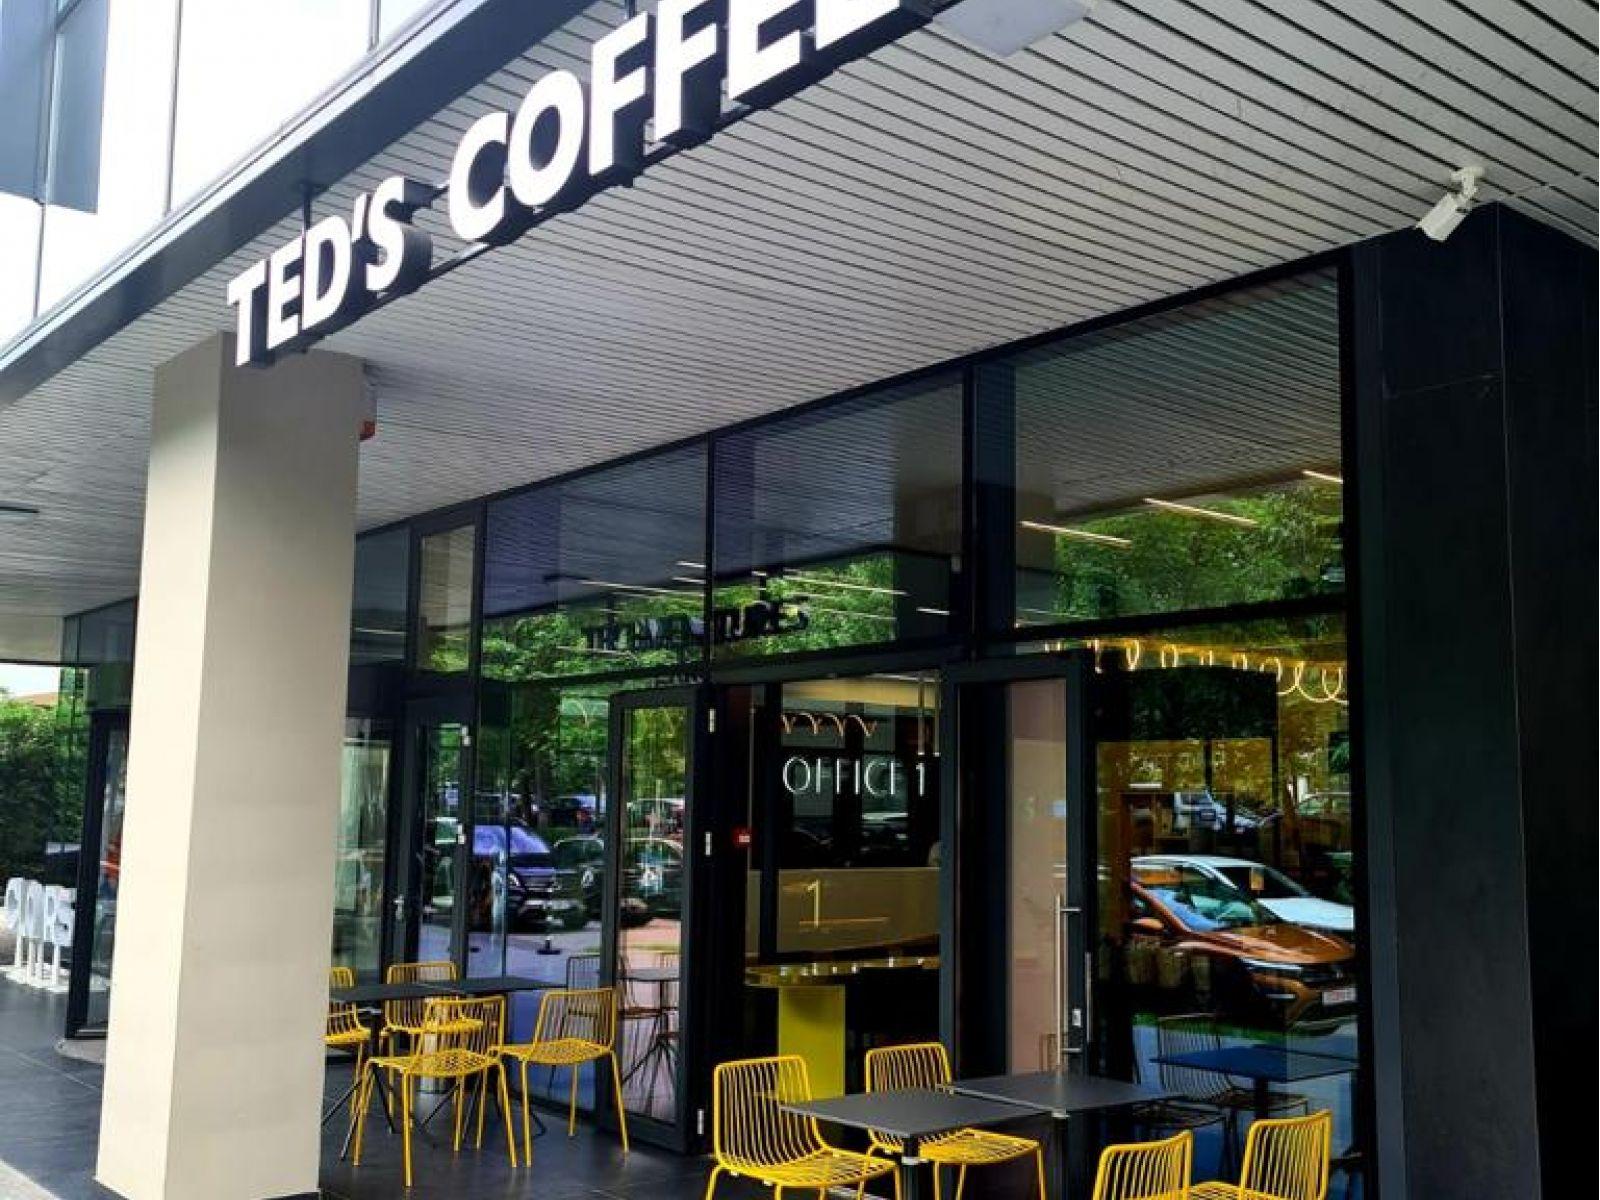 Ted's Coffee at One Herăstrău Office